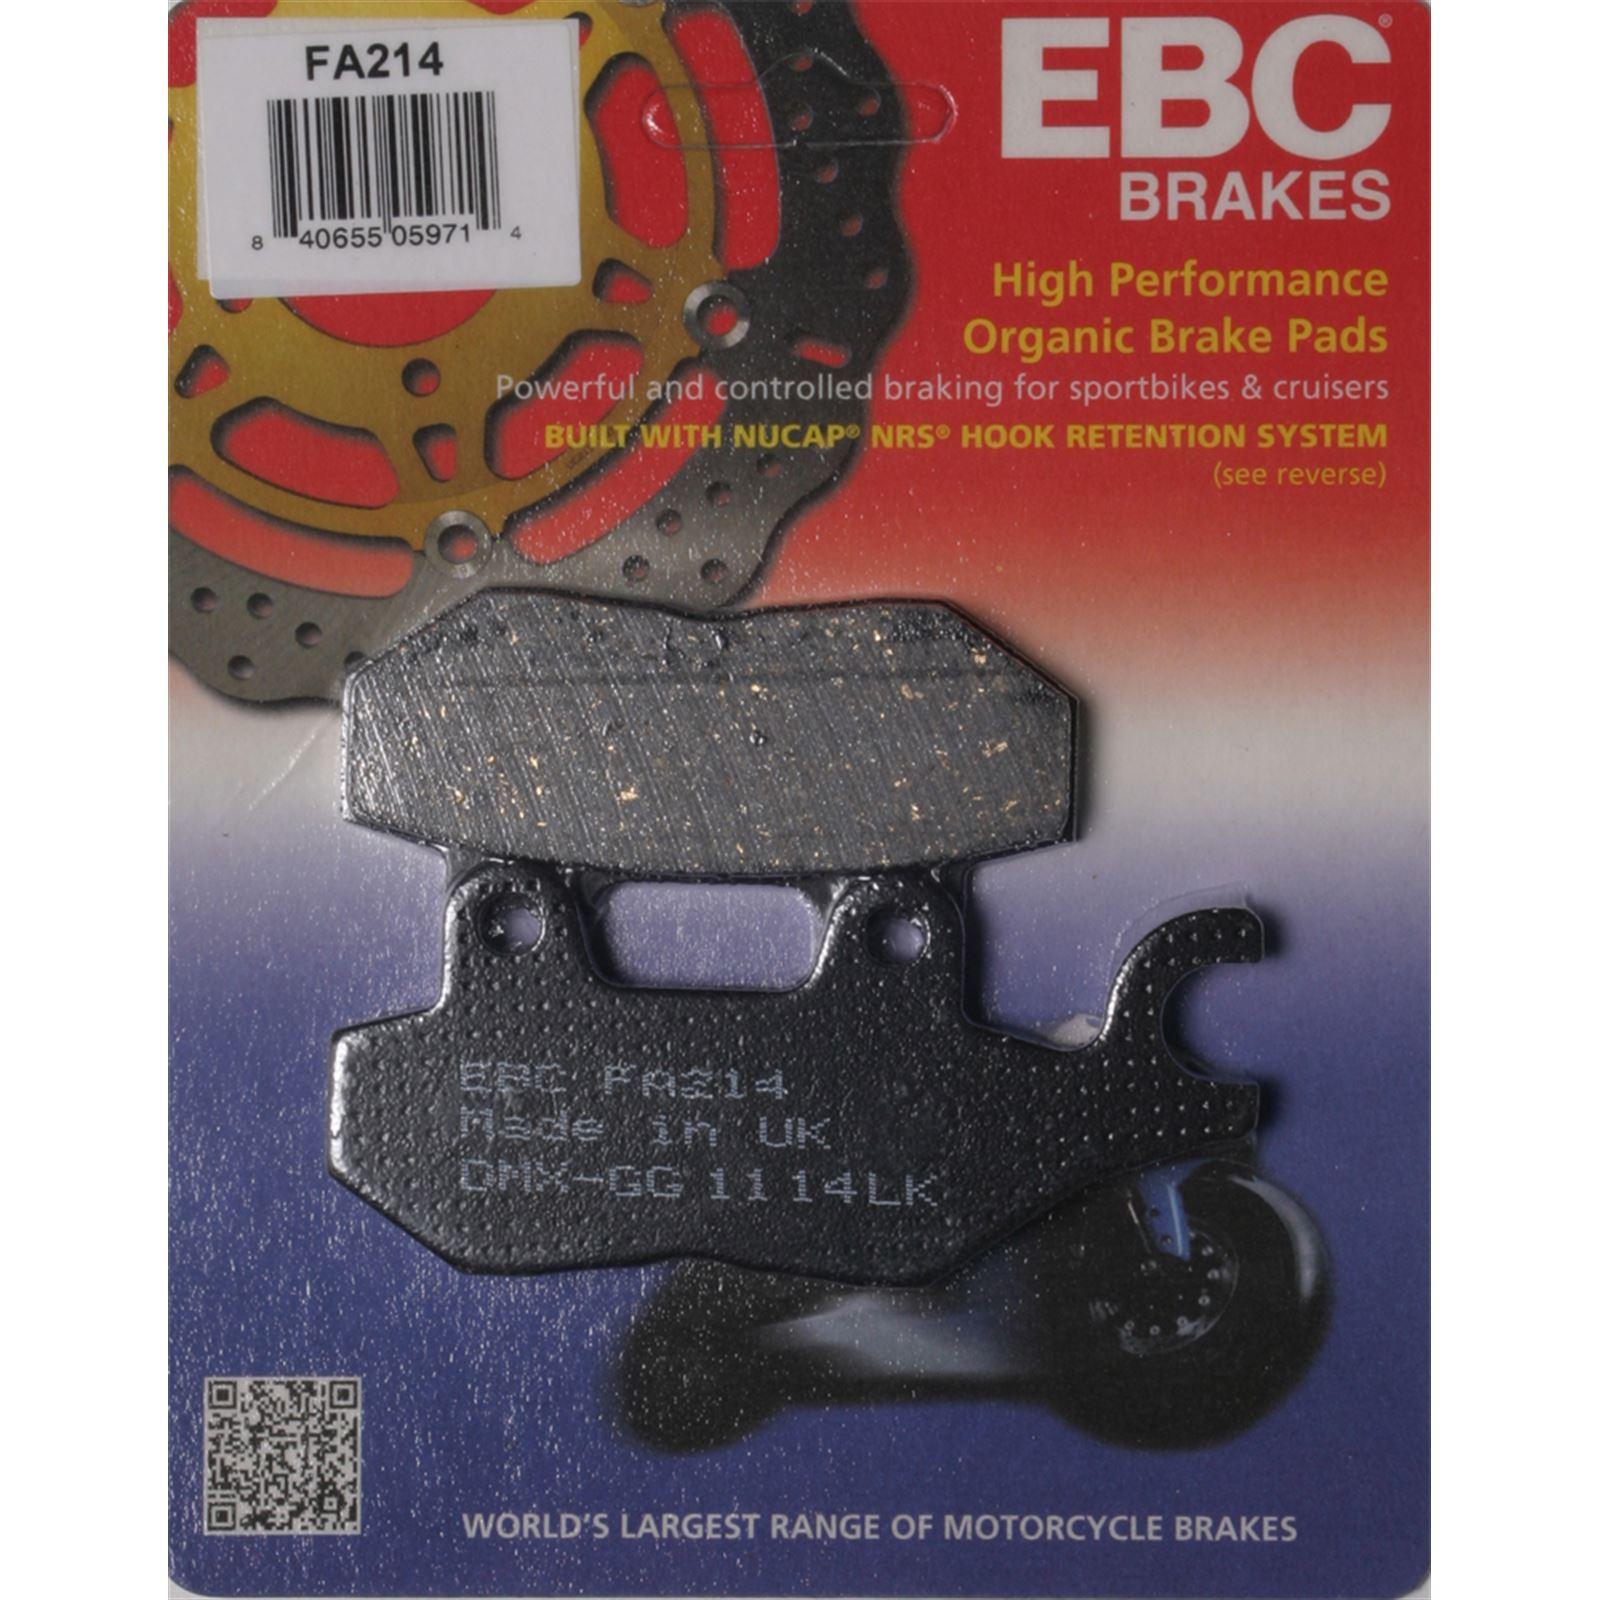 EBC Organic Brake Pads